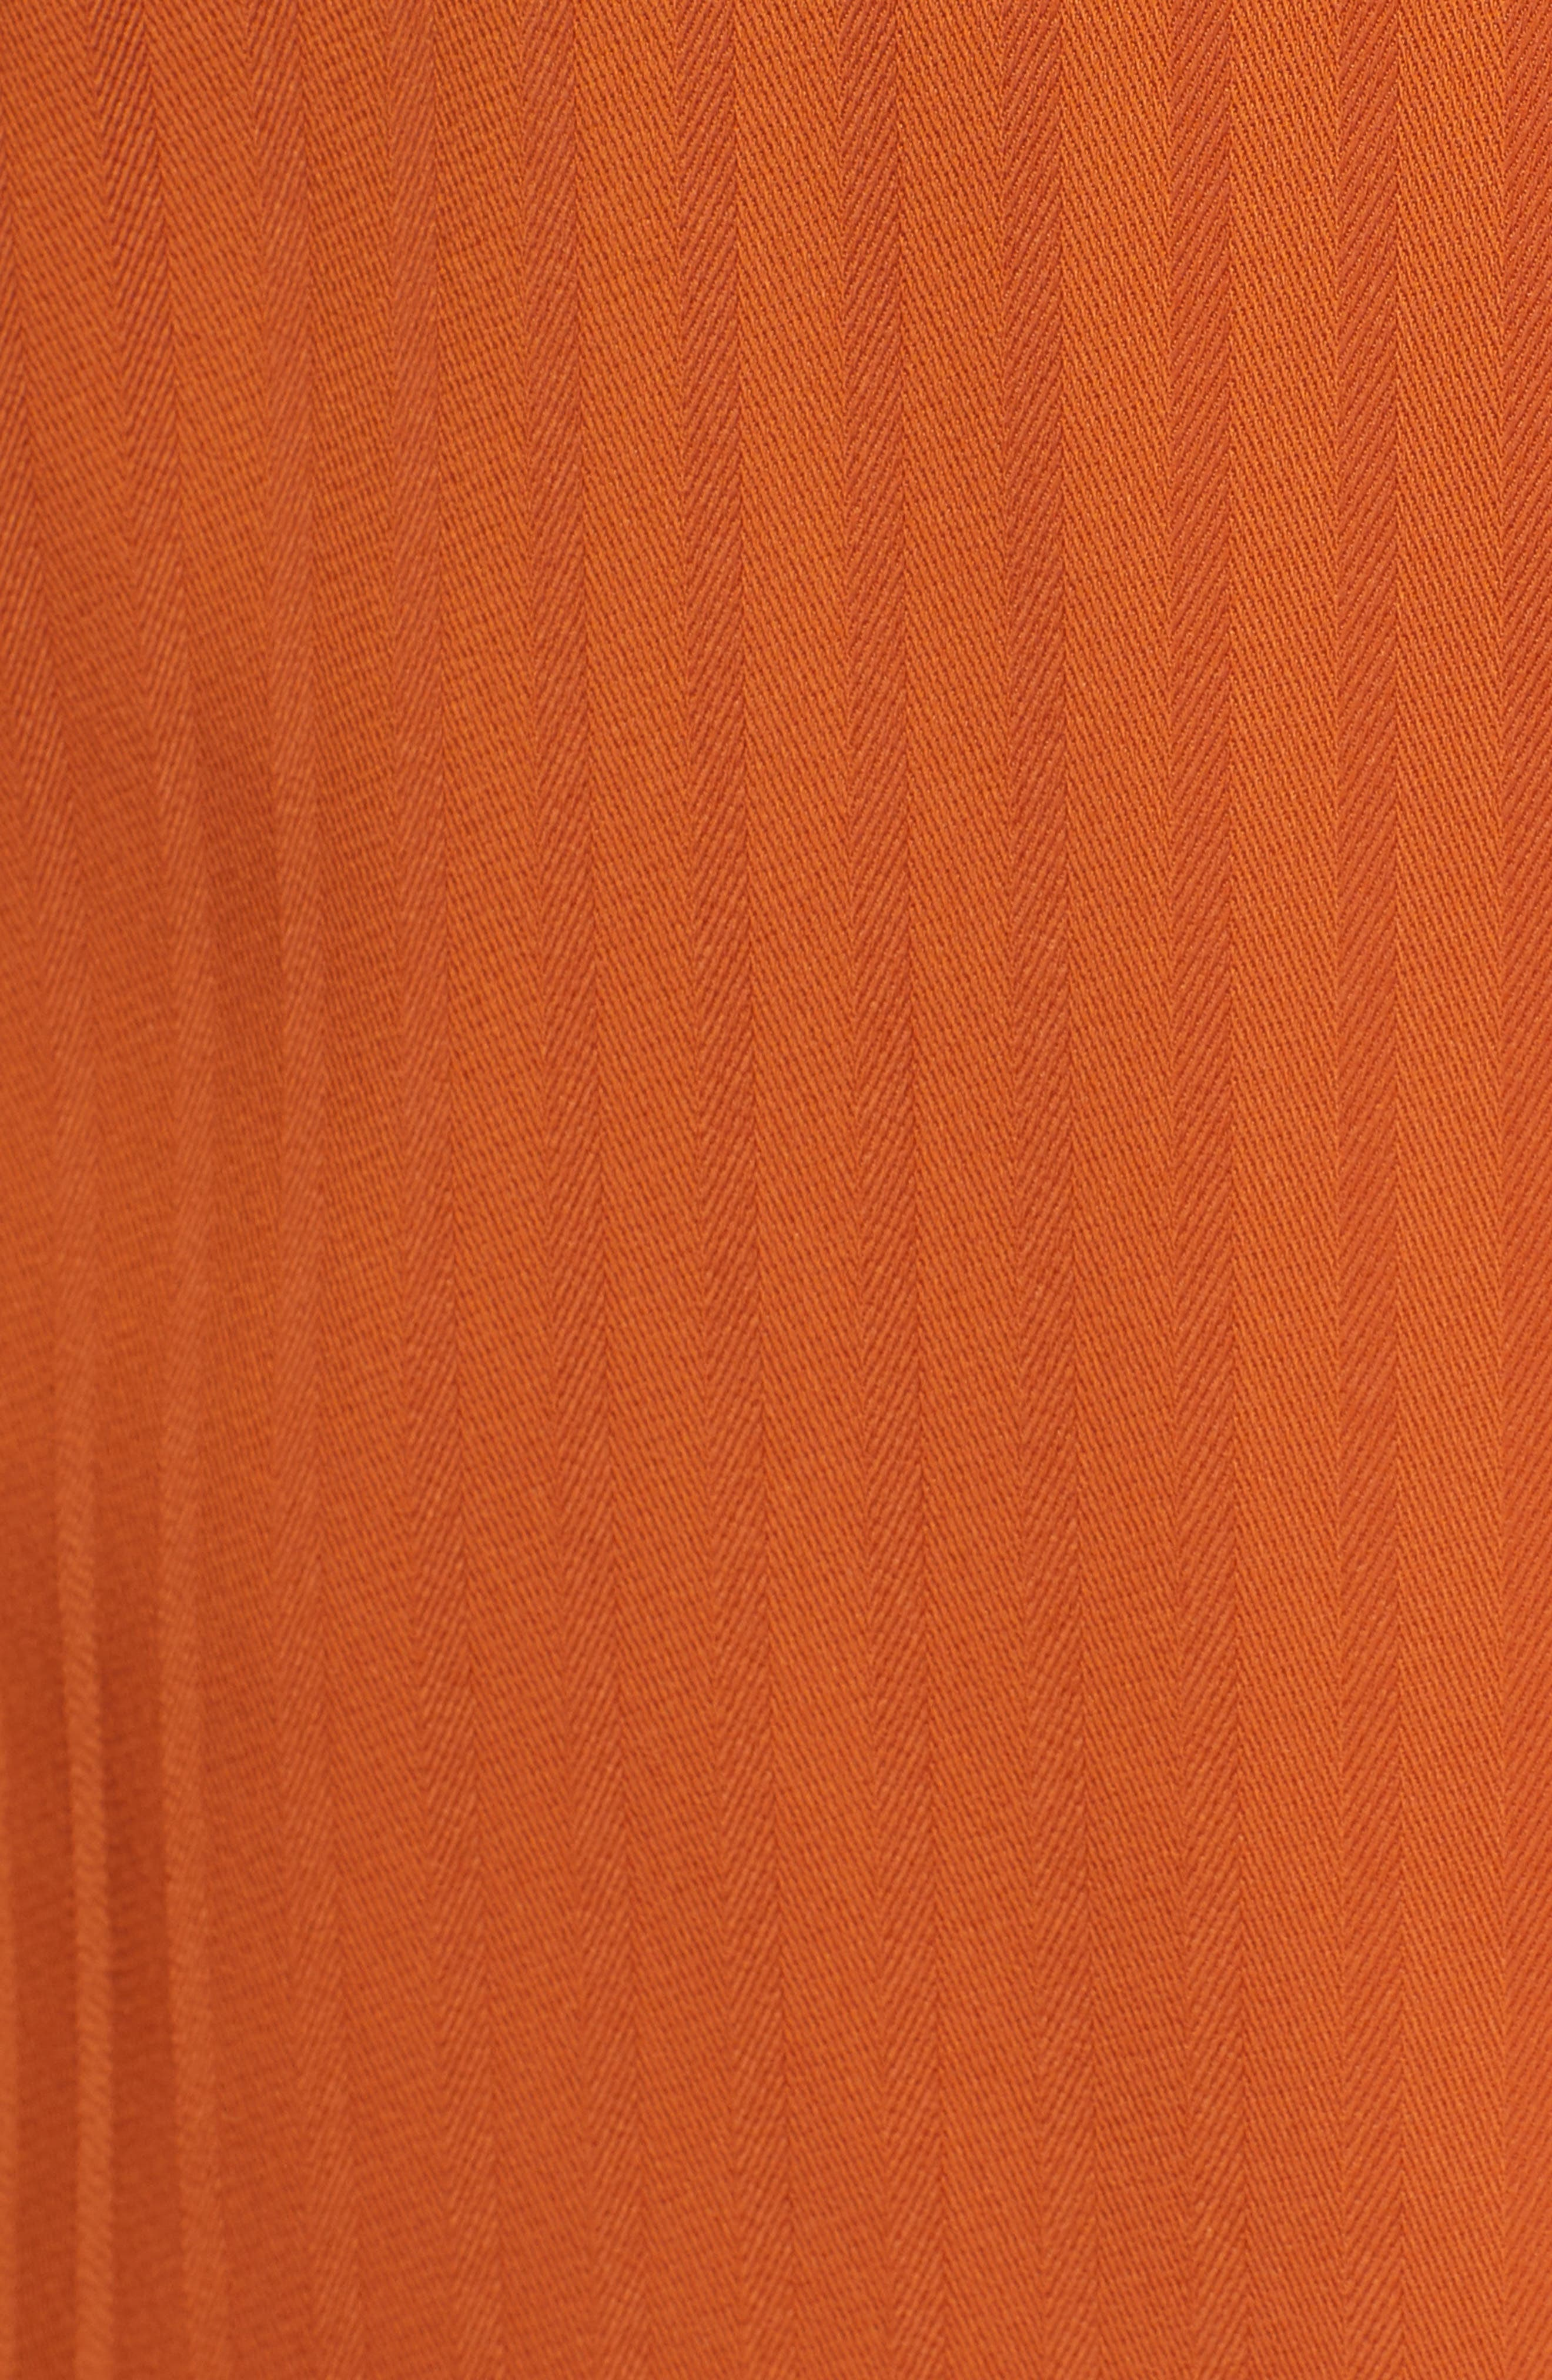 Draped One-Shoulder Top,                             Alternate thumbnail 6, color,                             Rust Cider